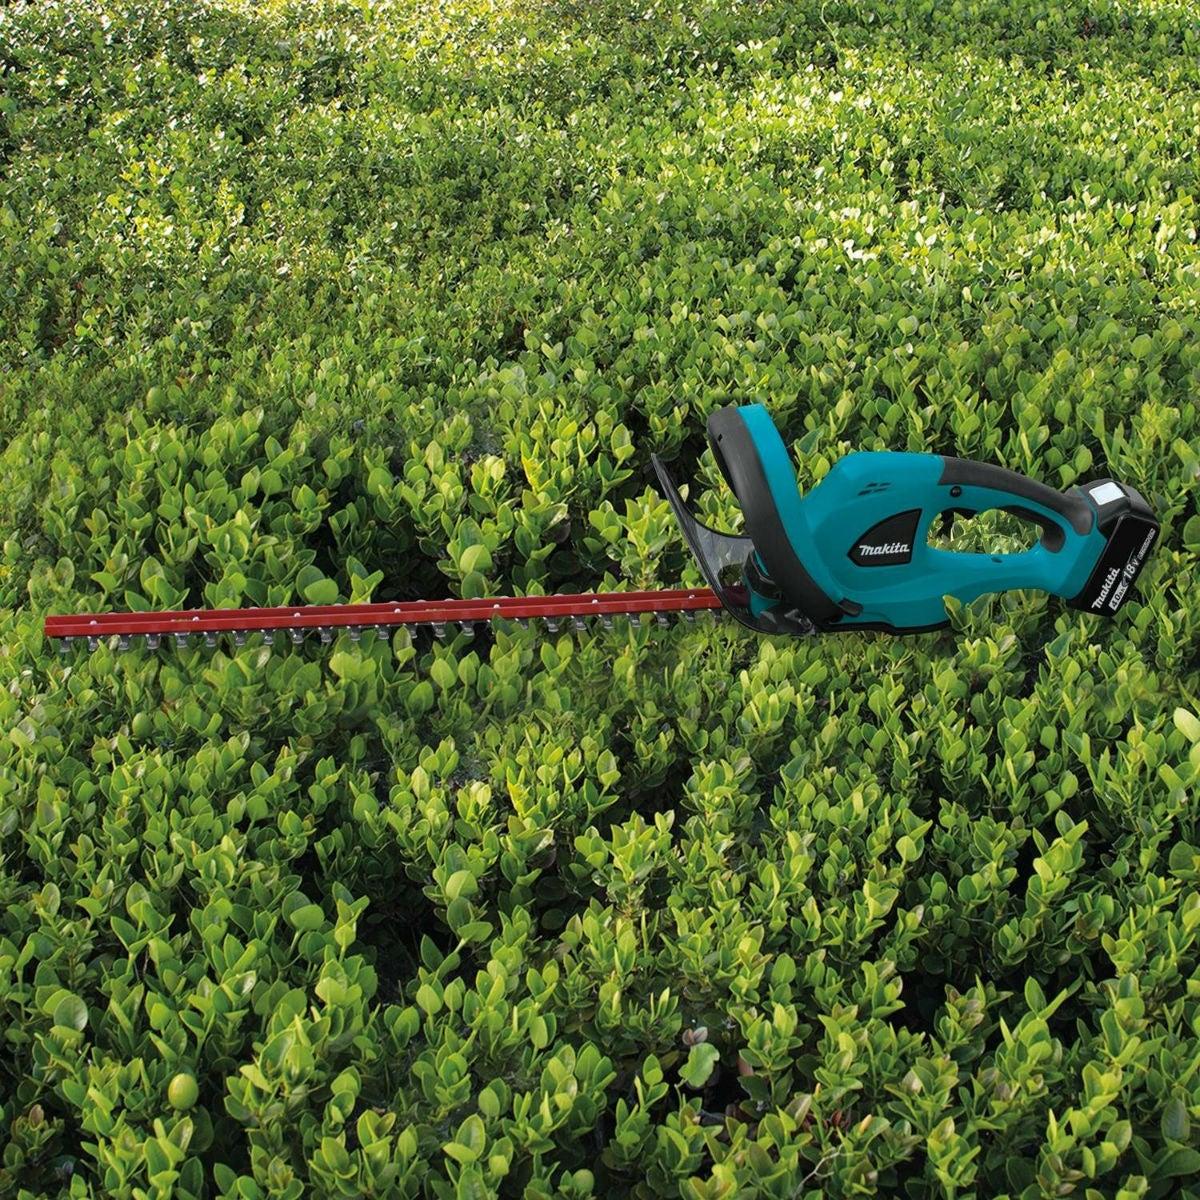 Best Hedge Trimmer: Makita